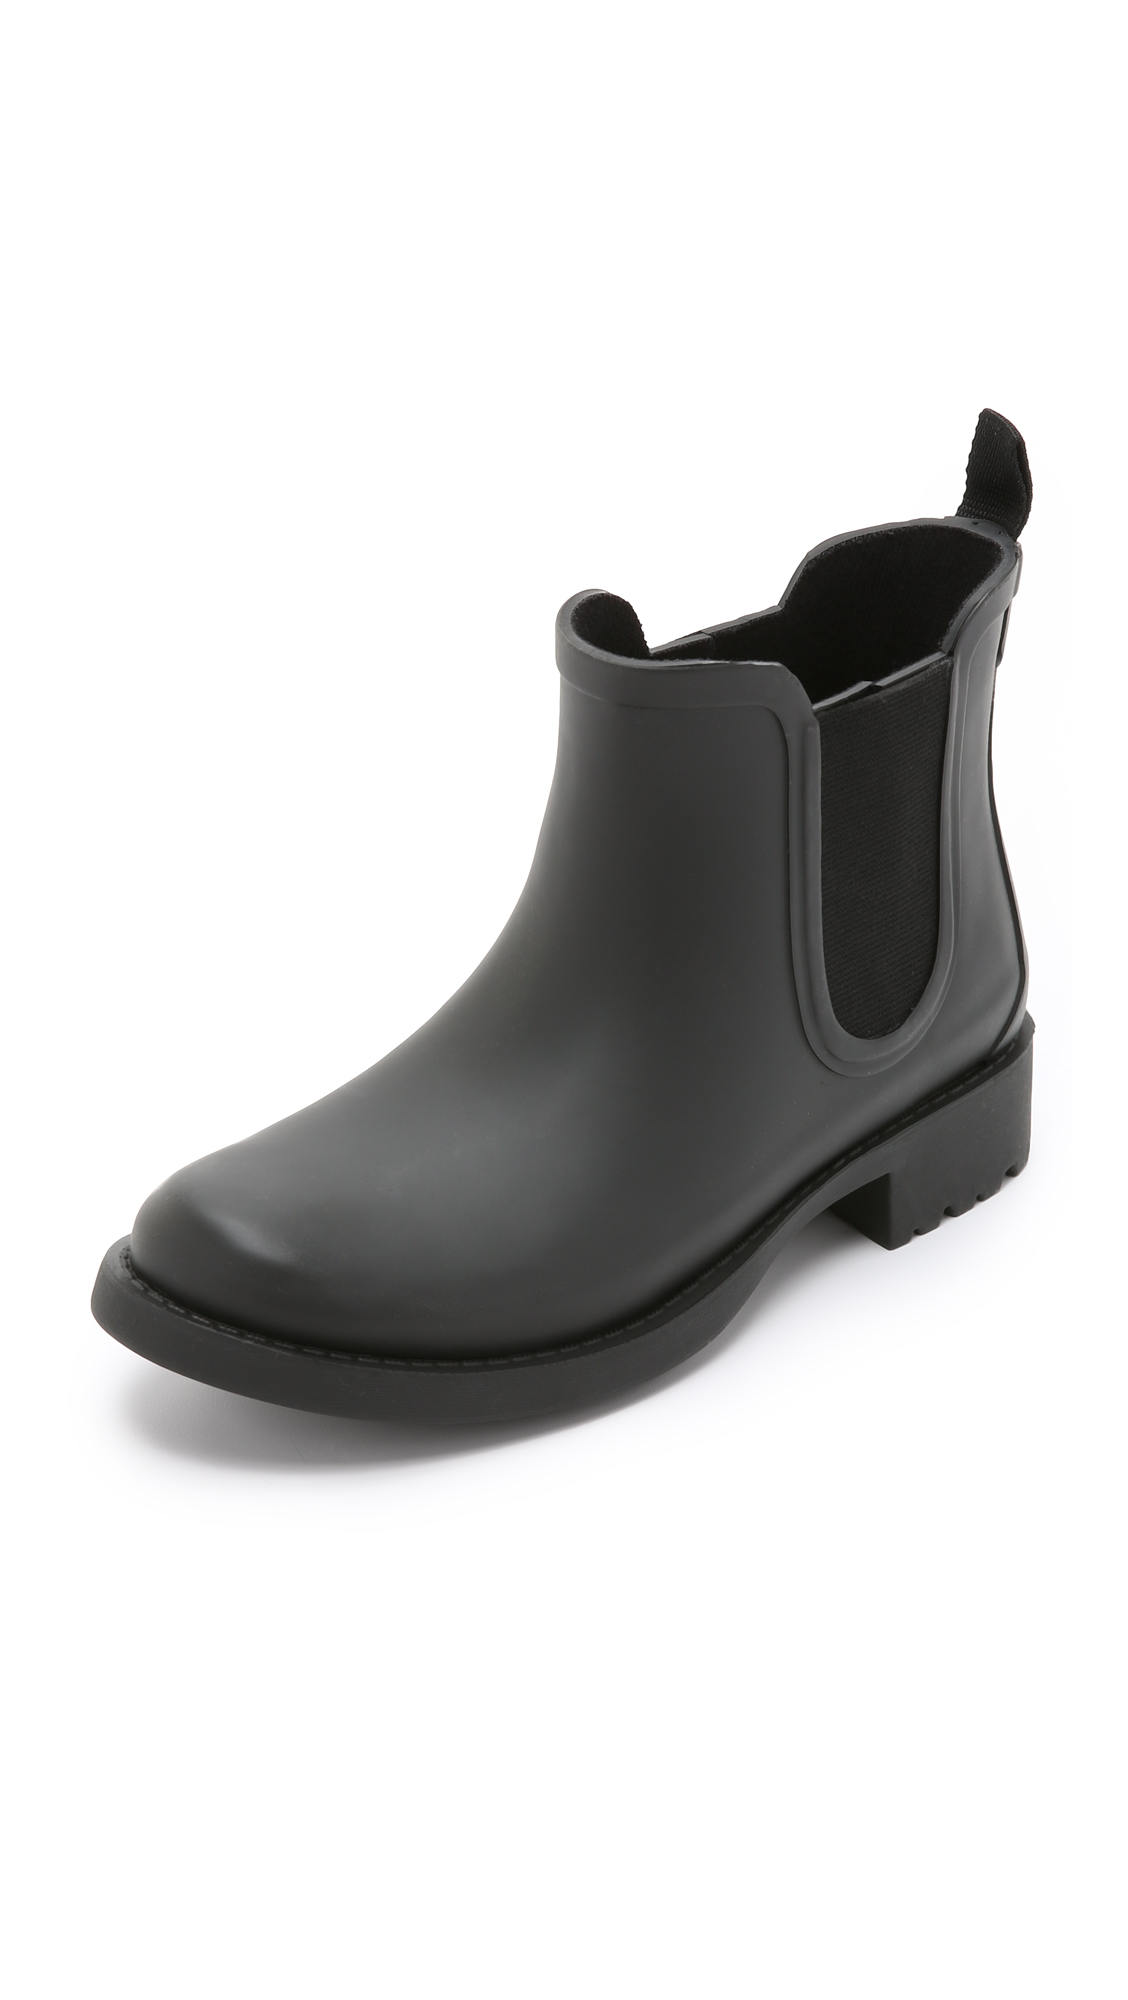 The Chelsea Rain Booties, True Black